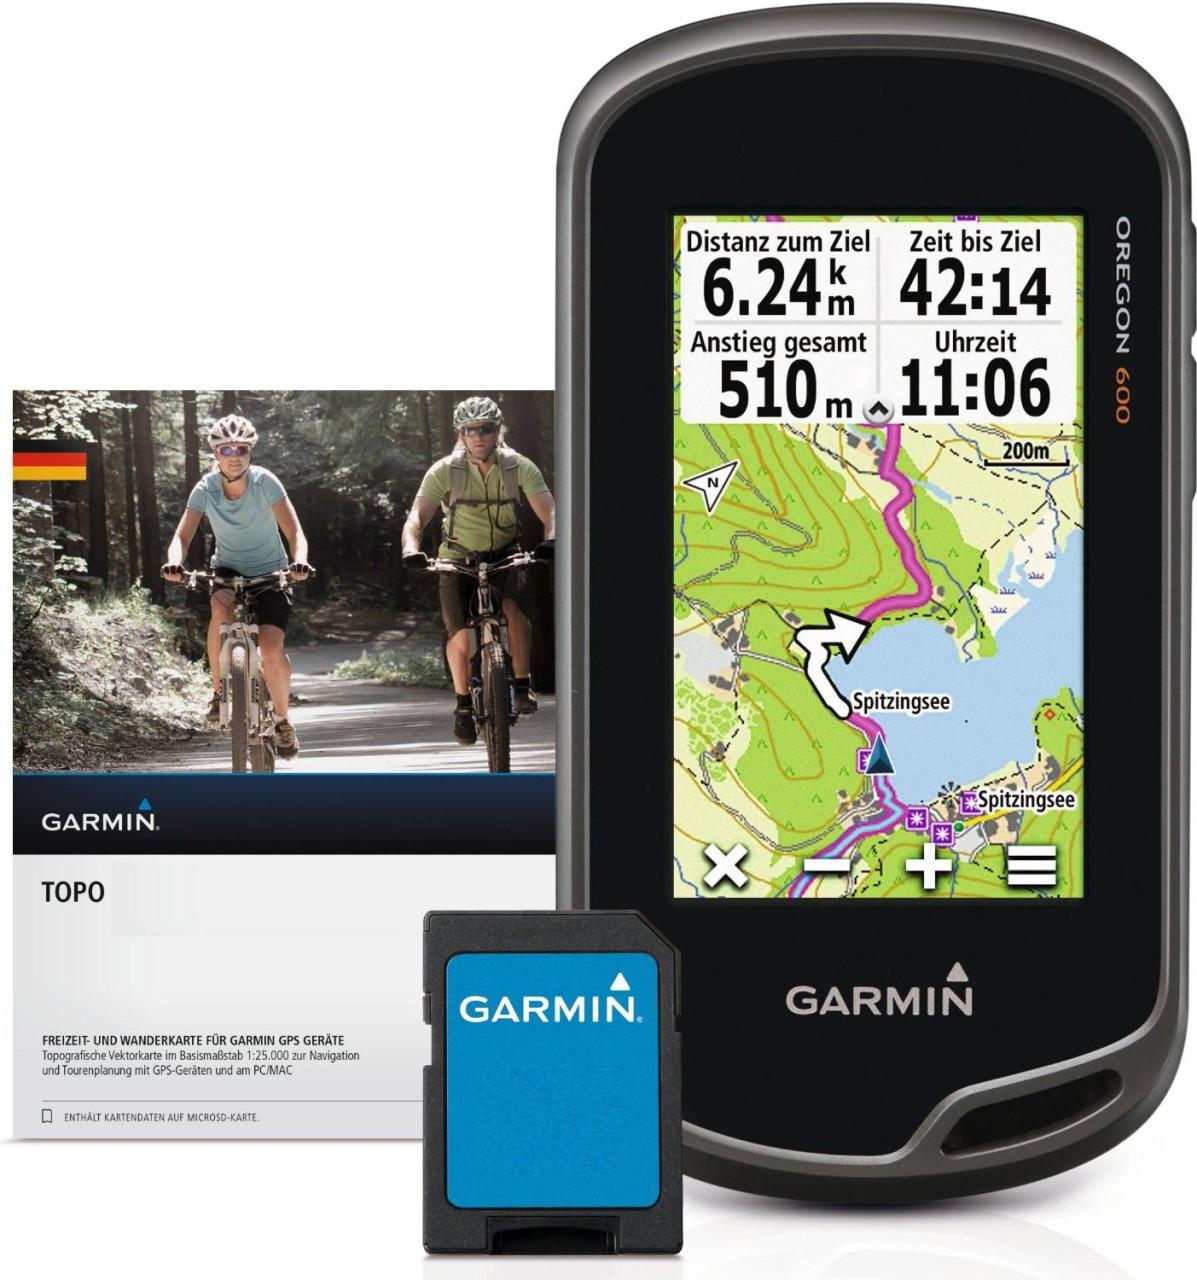 Garmin Oregon® 600 + Topo Deutschland V6 PRO Bundle microSD